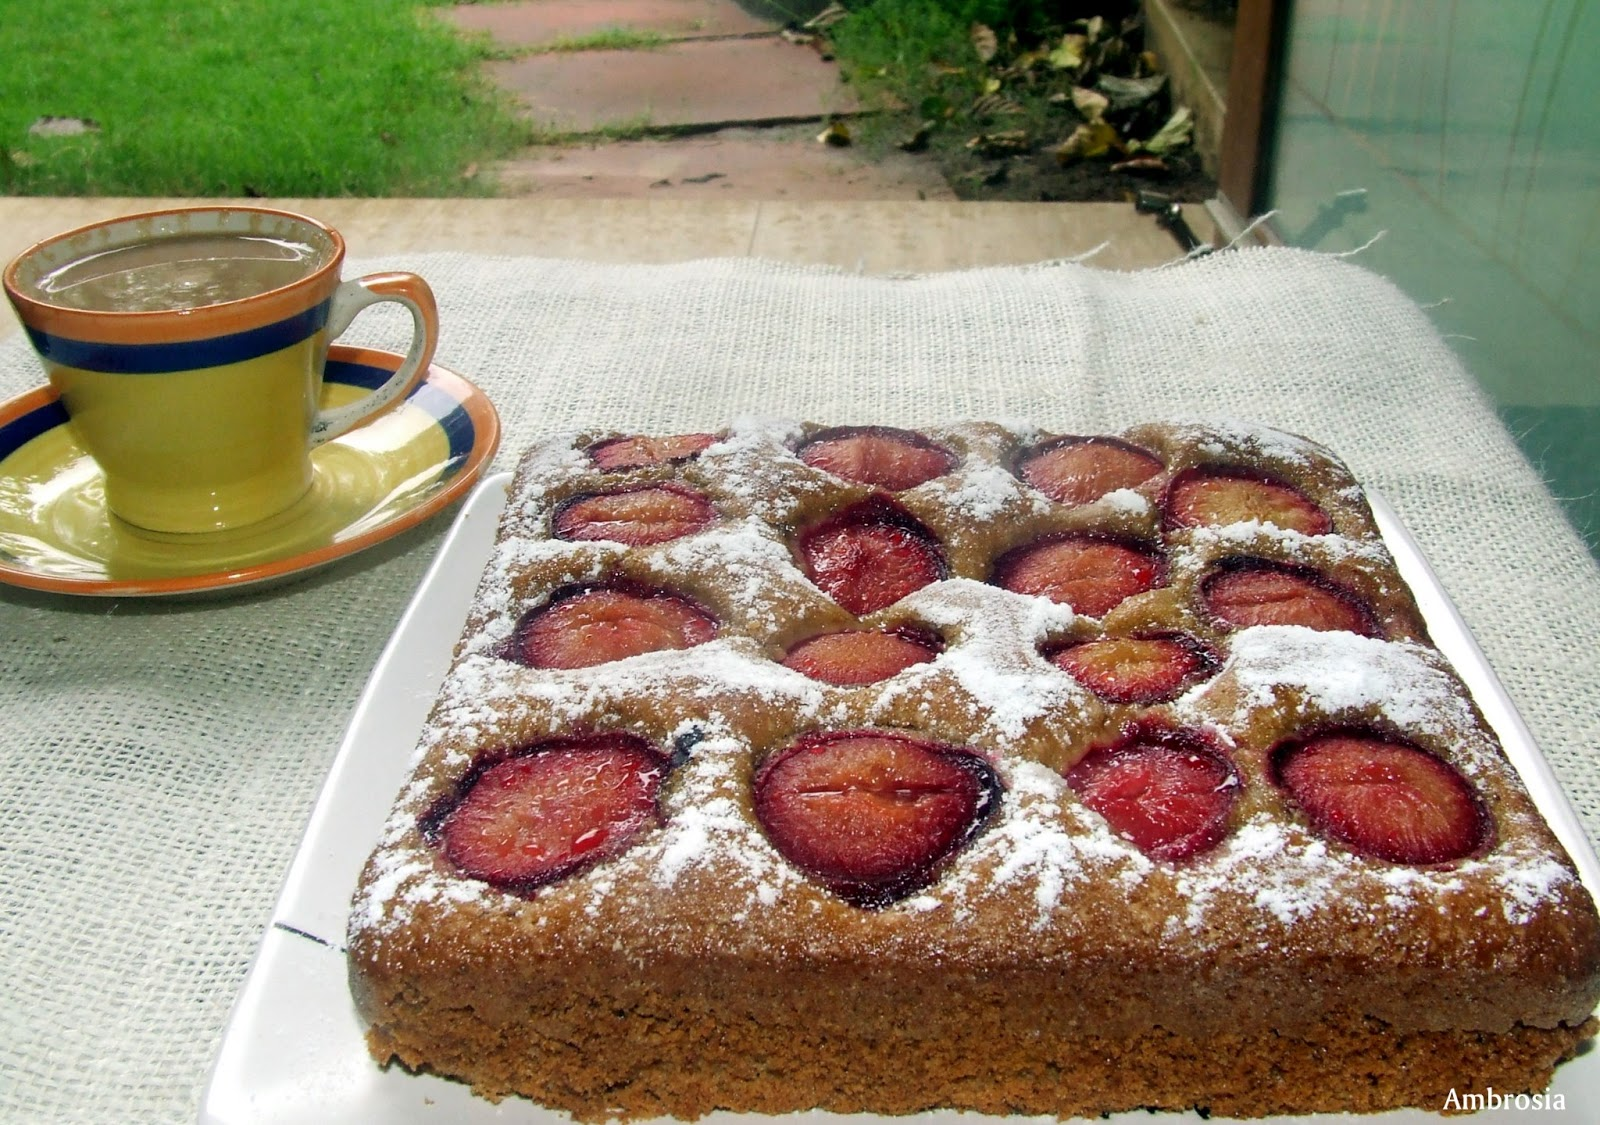 AMBROSIA: Dimply Plum Cake